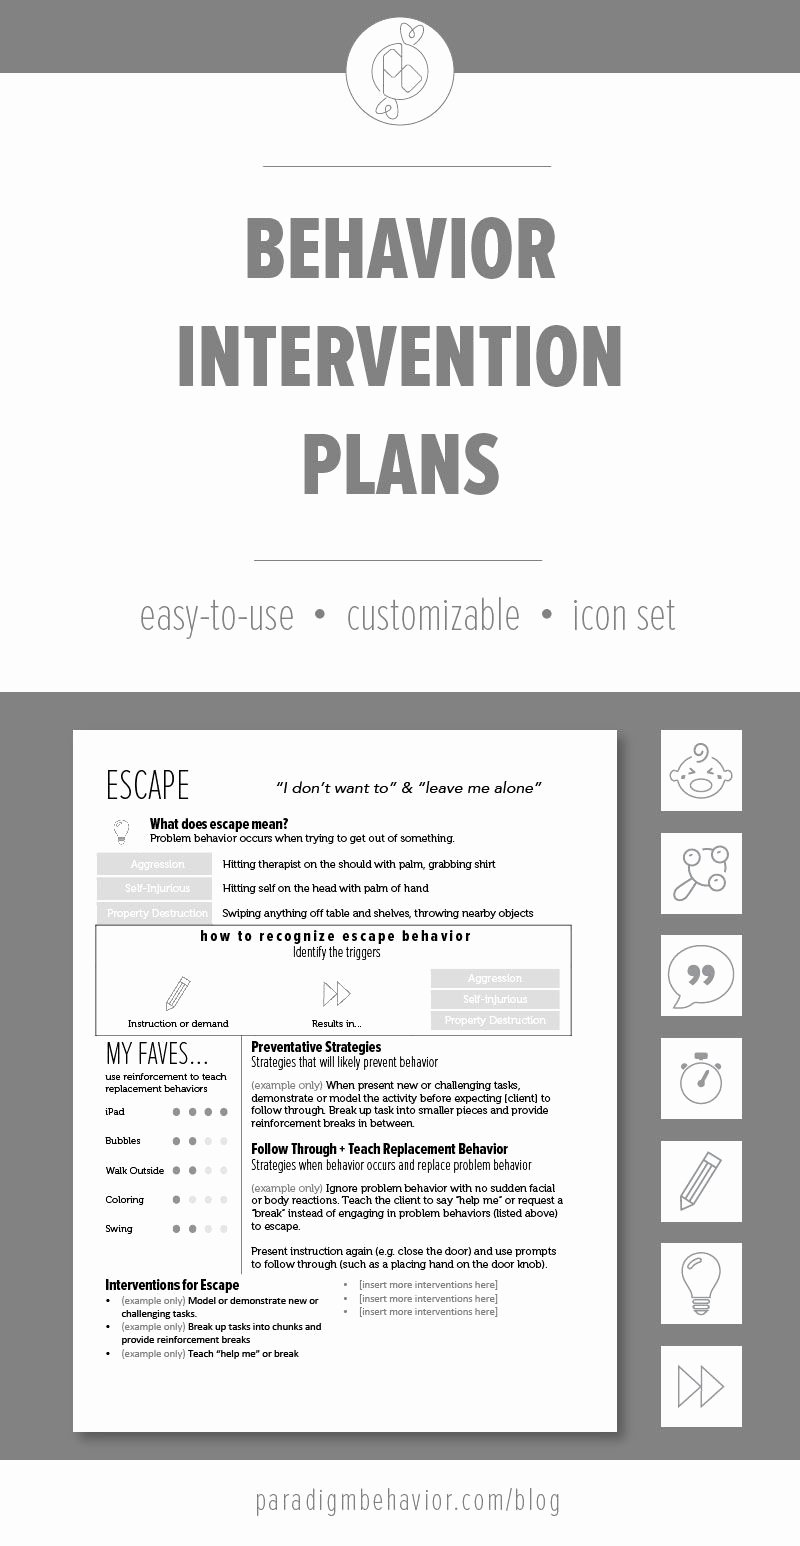 Behavior Intervention Plan Template Free Luxury these Behavior Intervention Plan Bip Templates are Meant